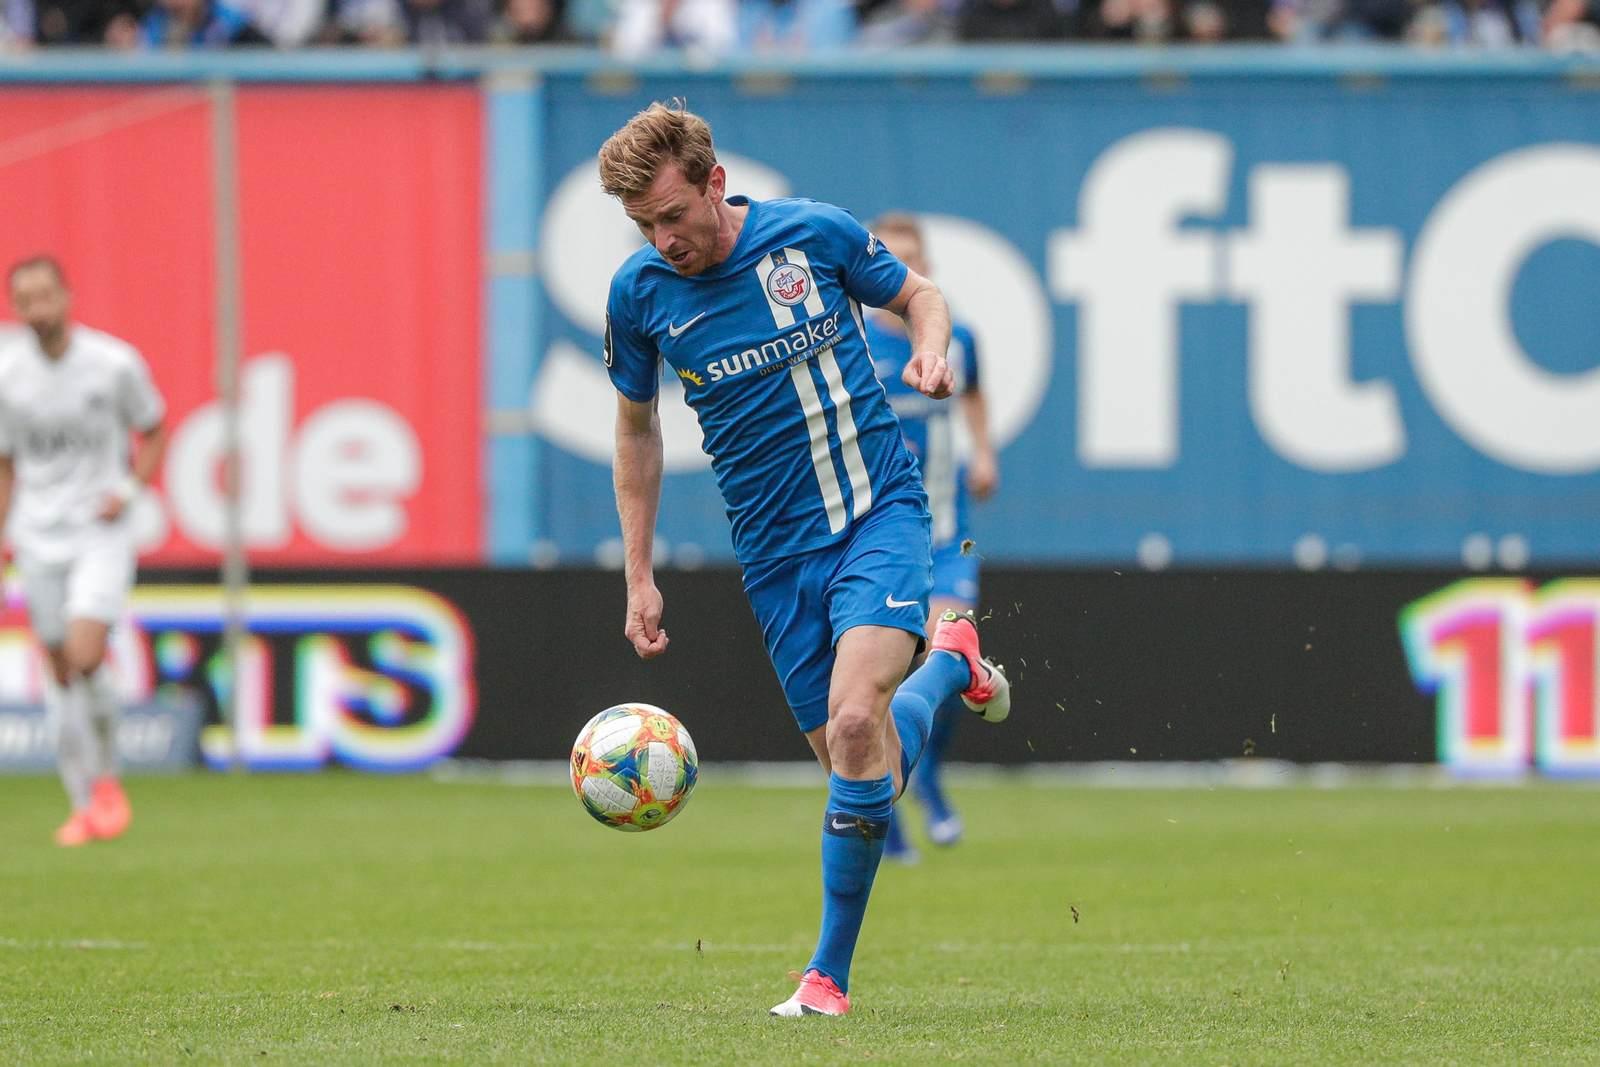 Maximilian Ahlschwede am Ball für Hansa Rostock